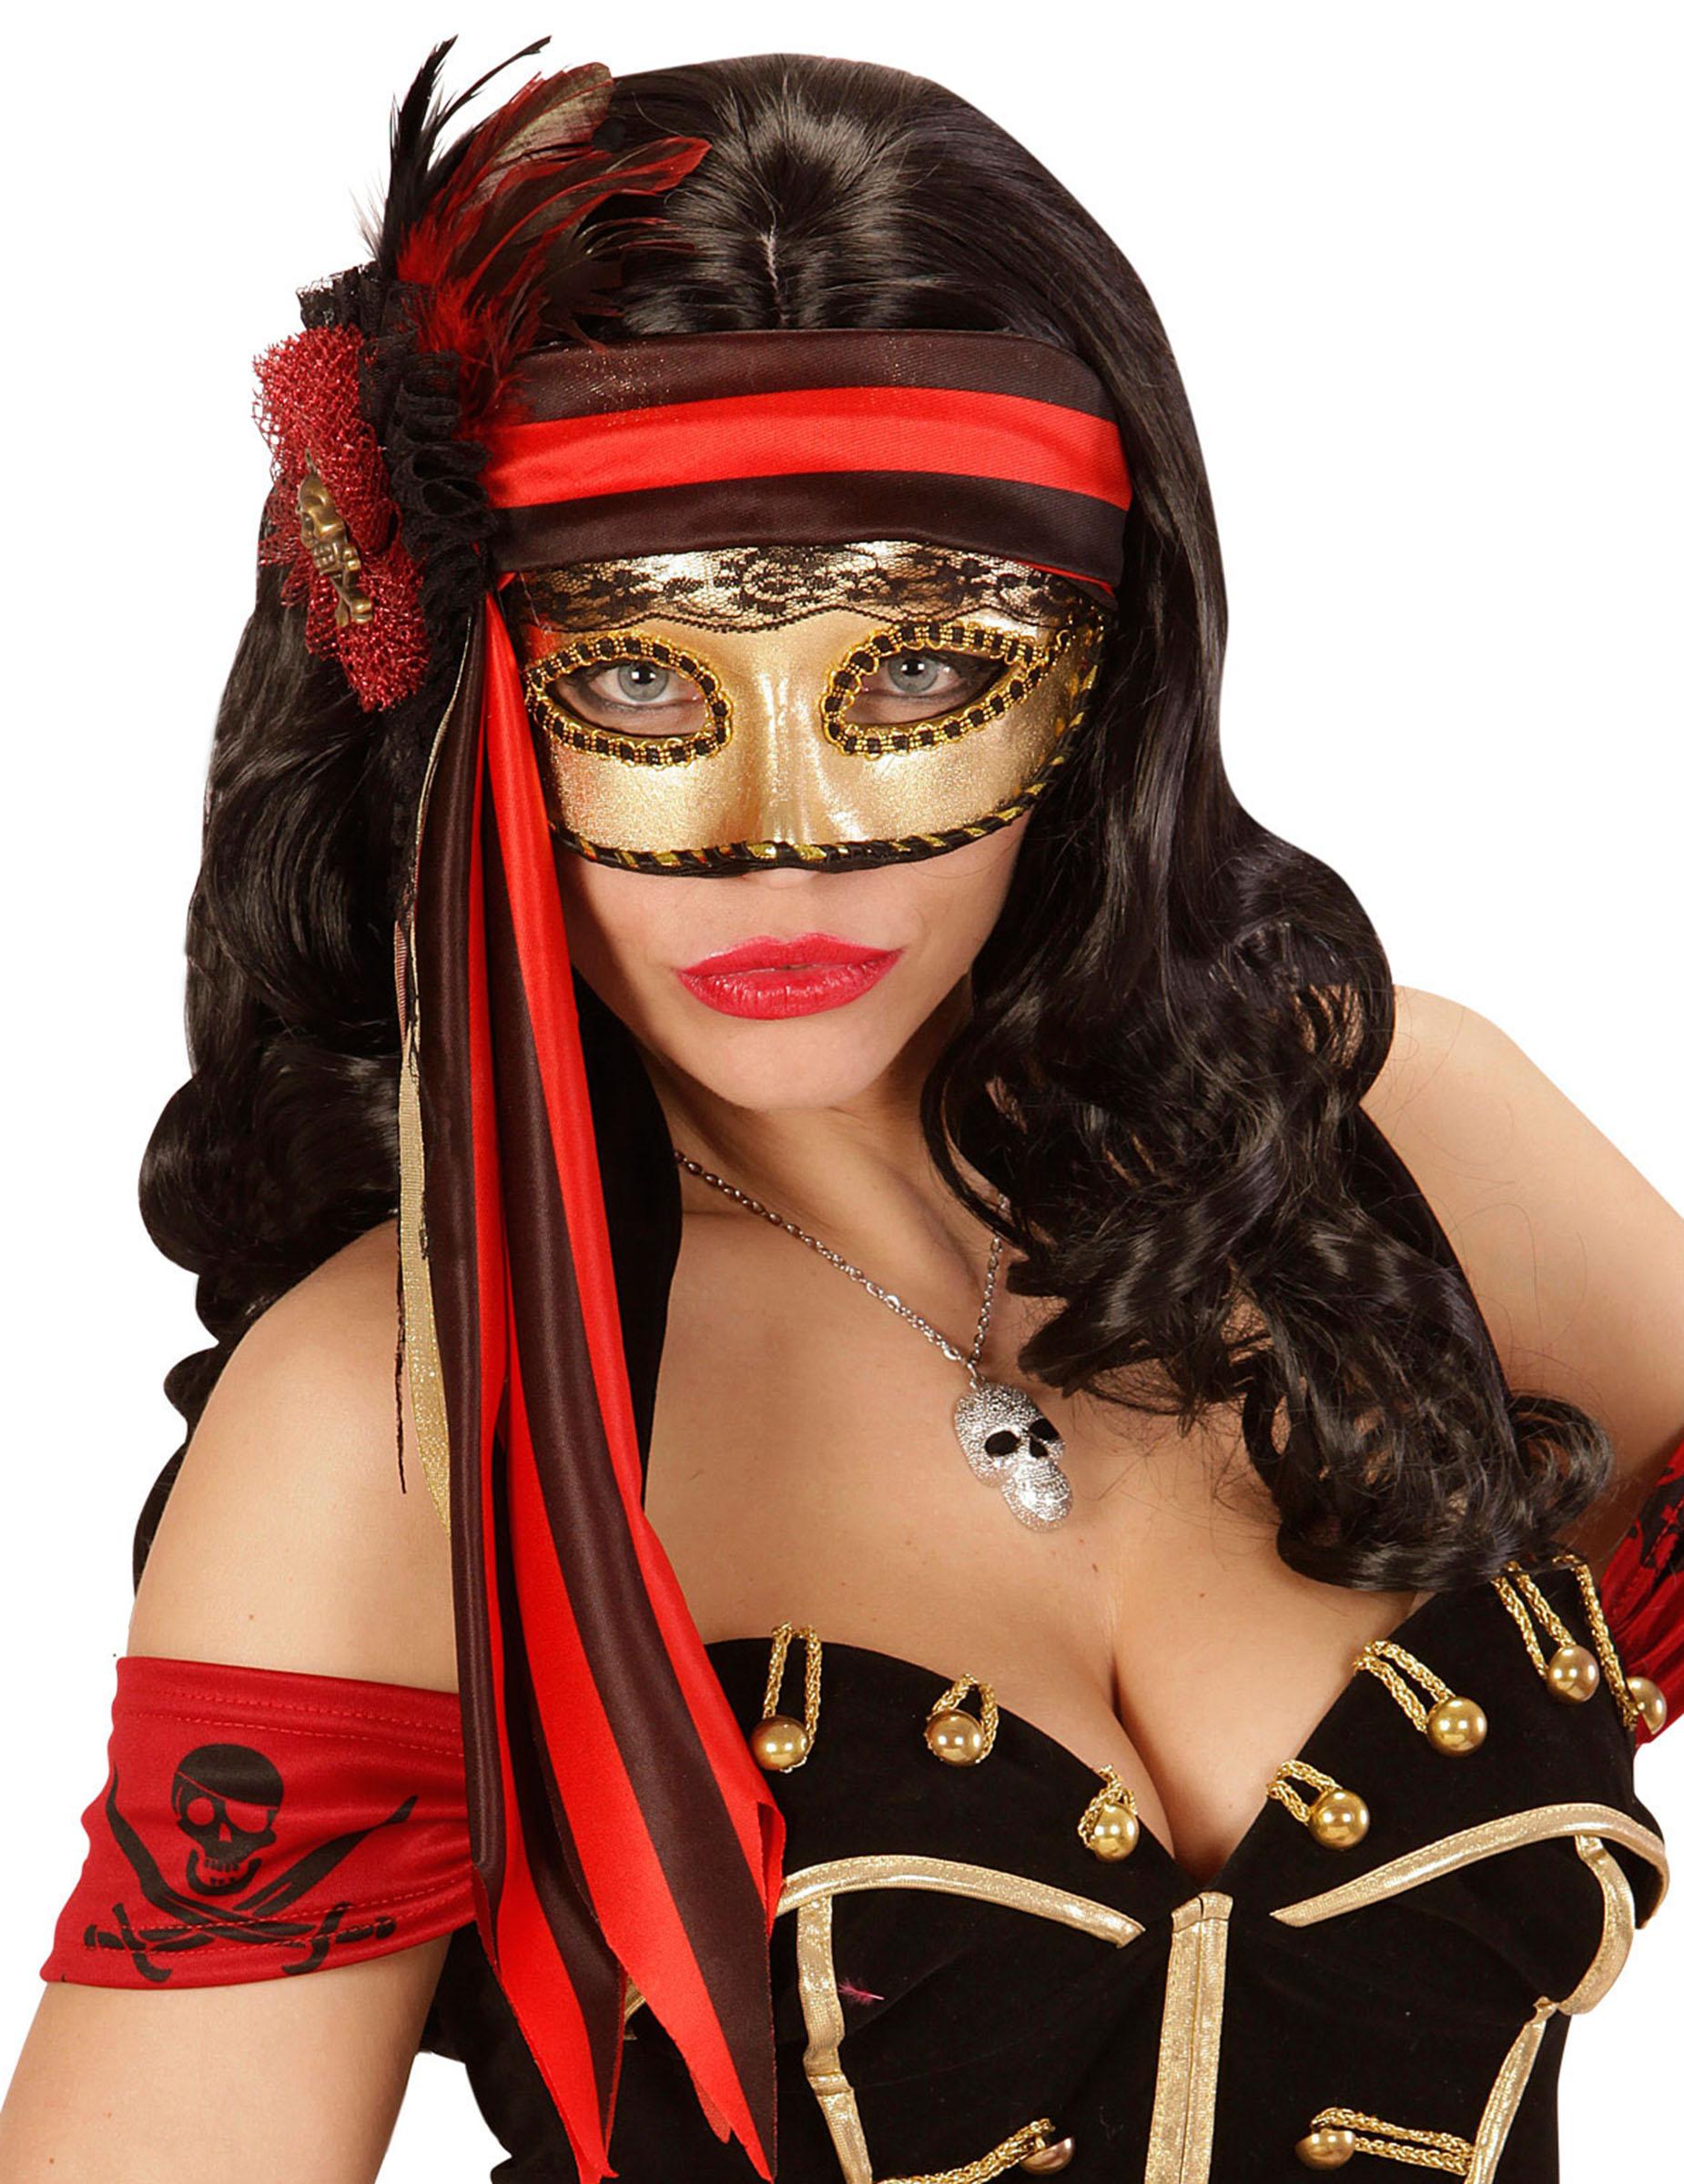 Loup Pirate Femme Deguise Toi Achat De Masques